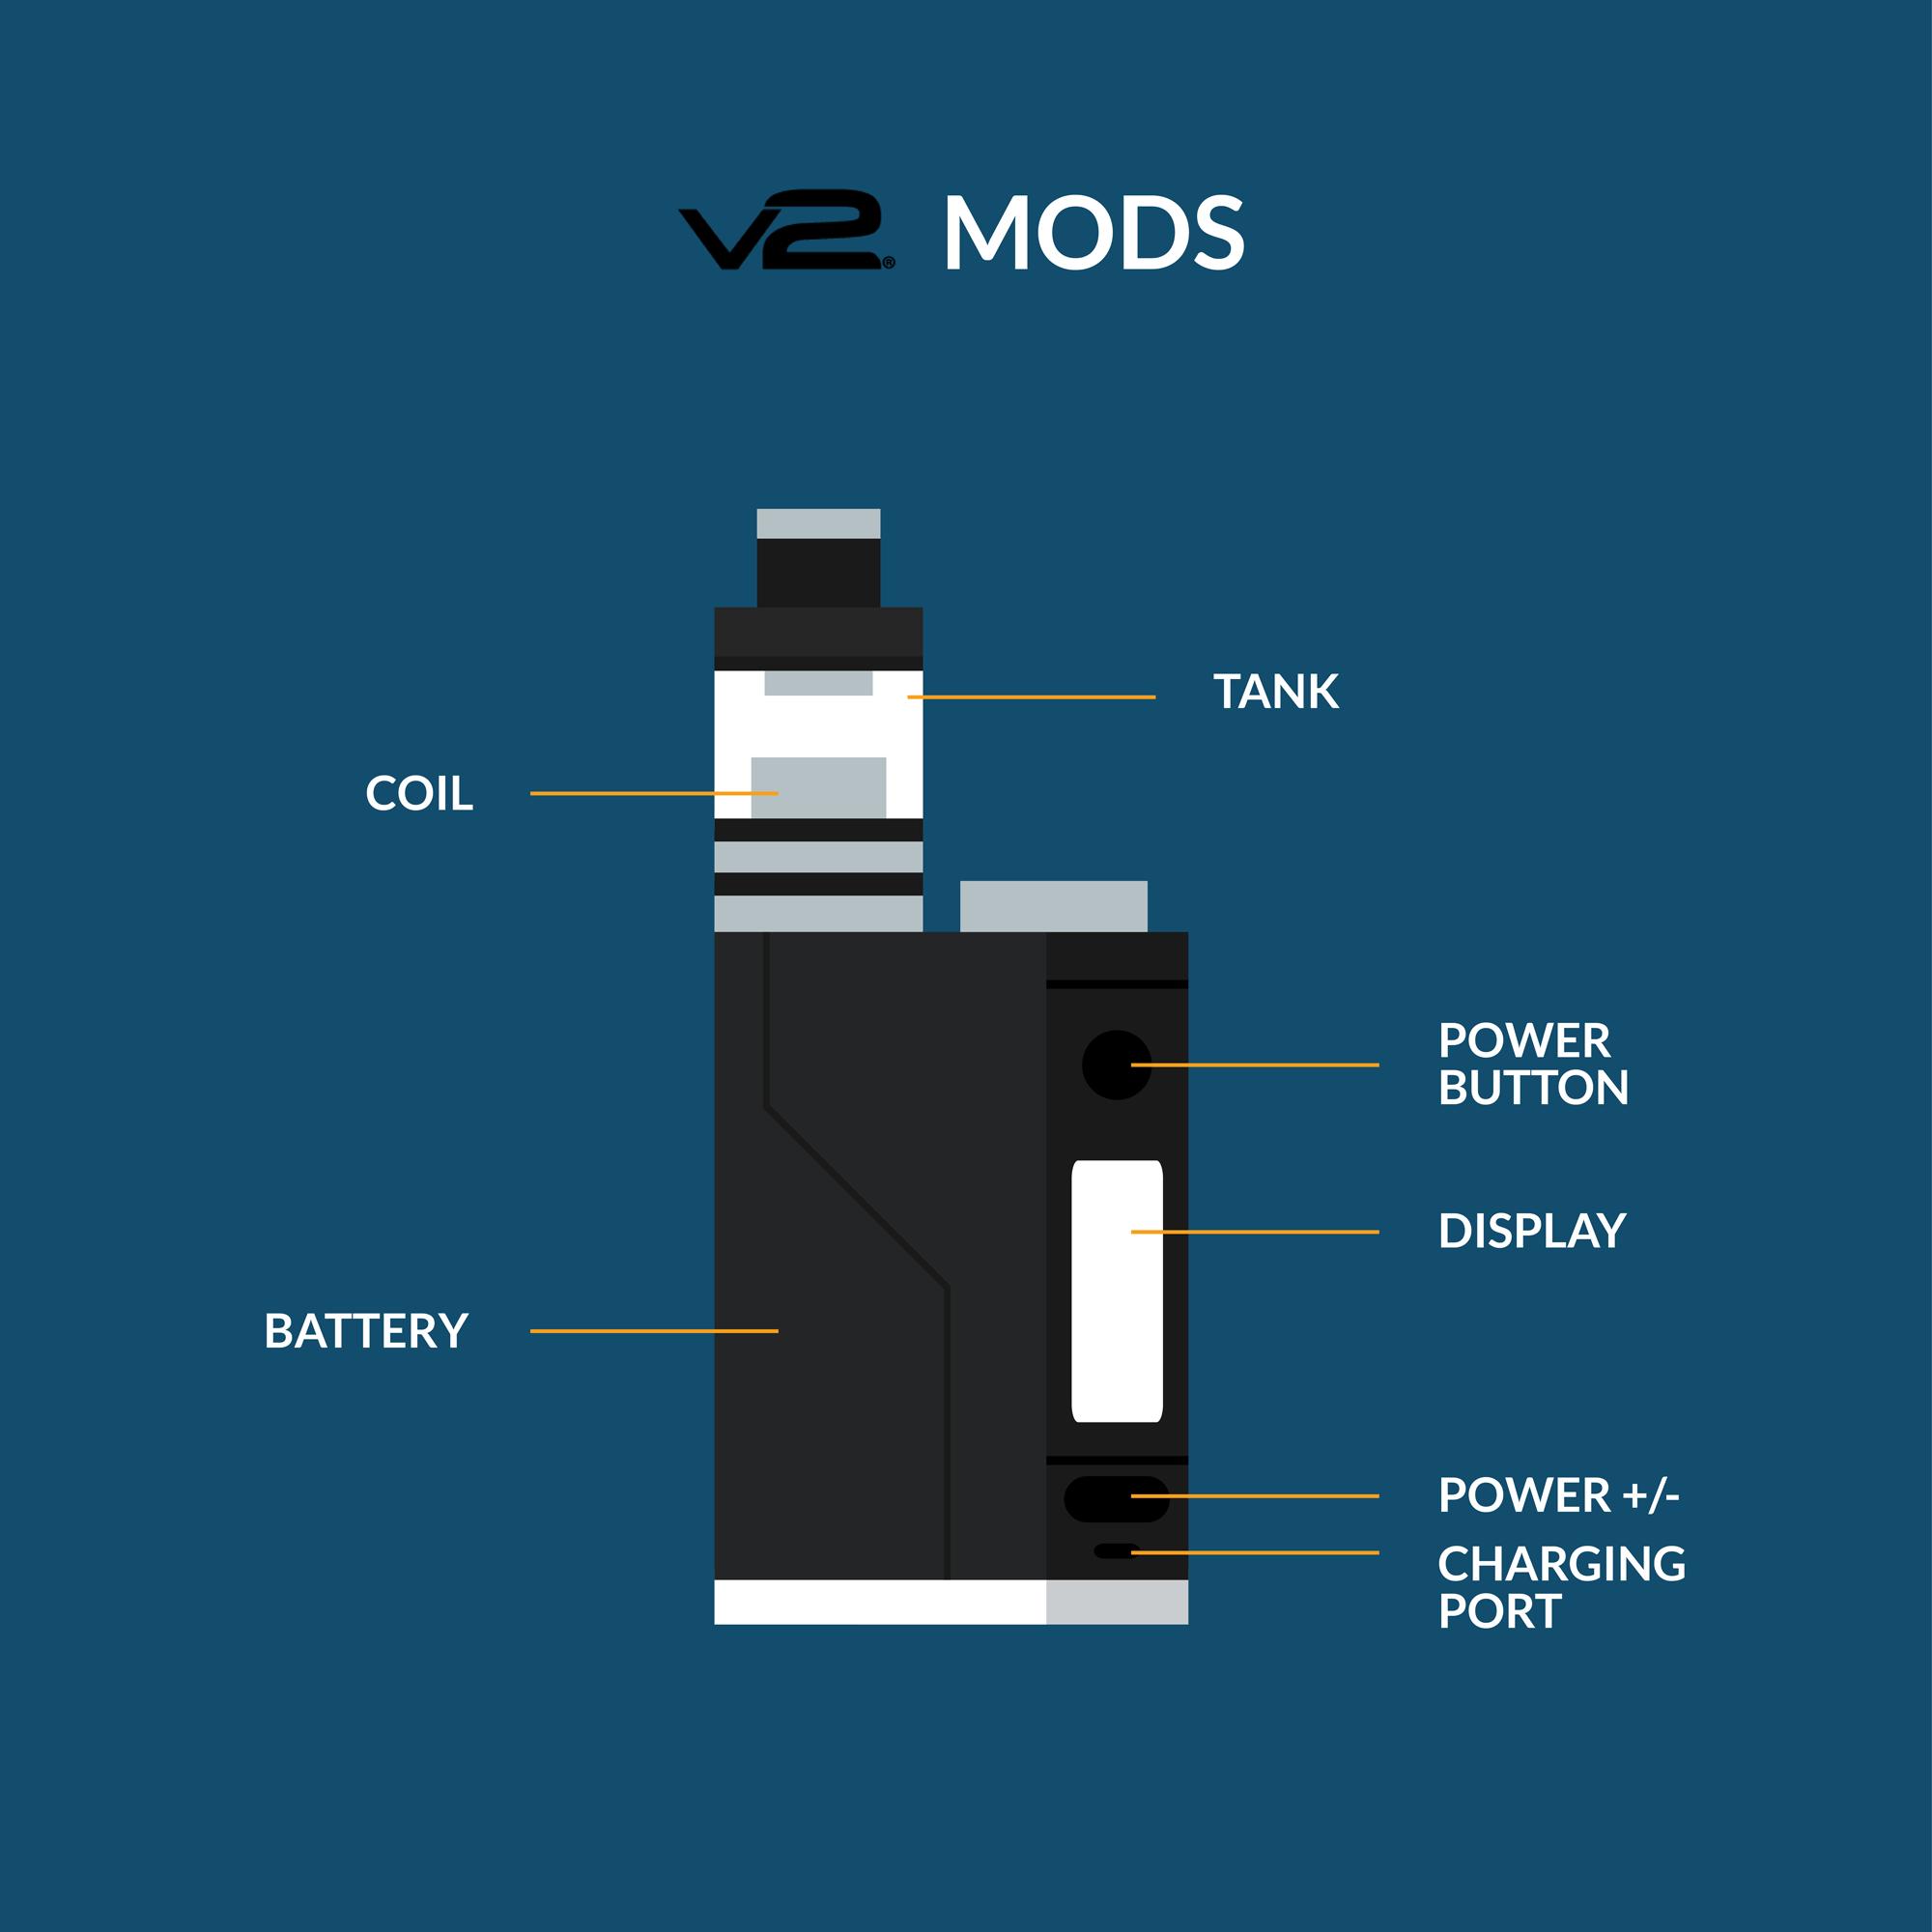 Device type – Vape Mods